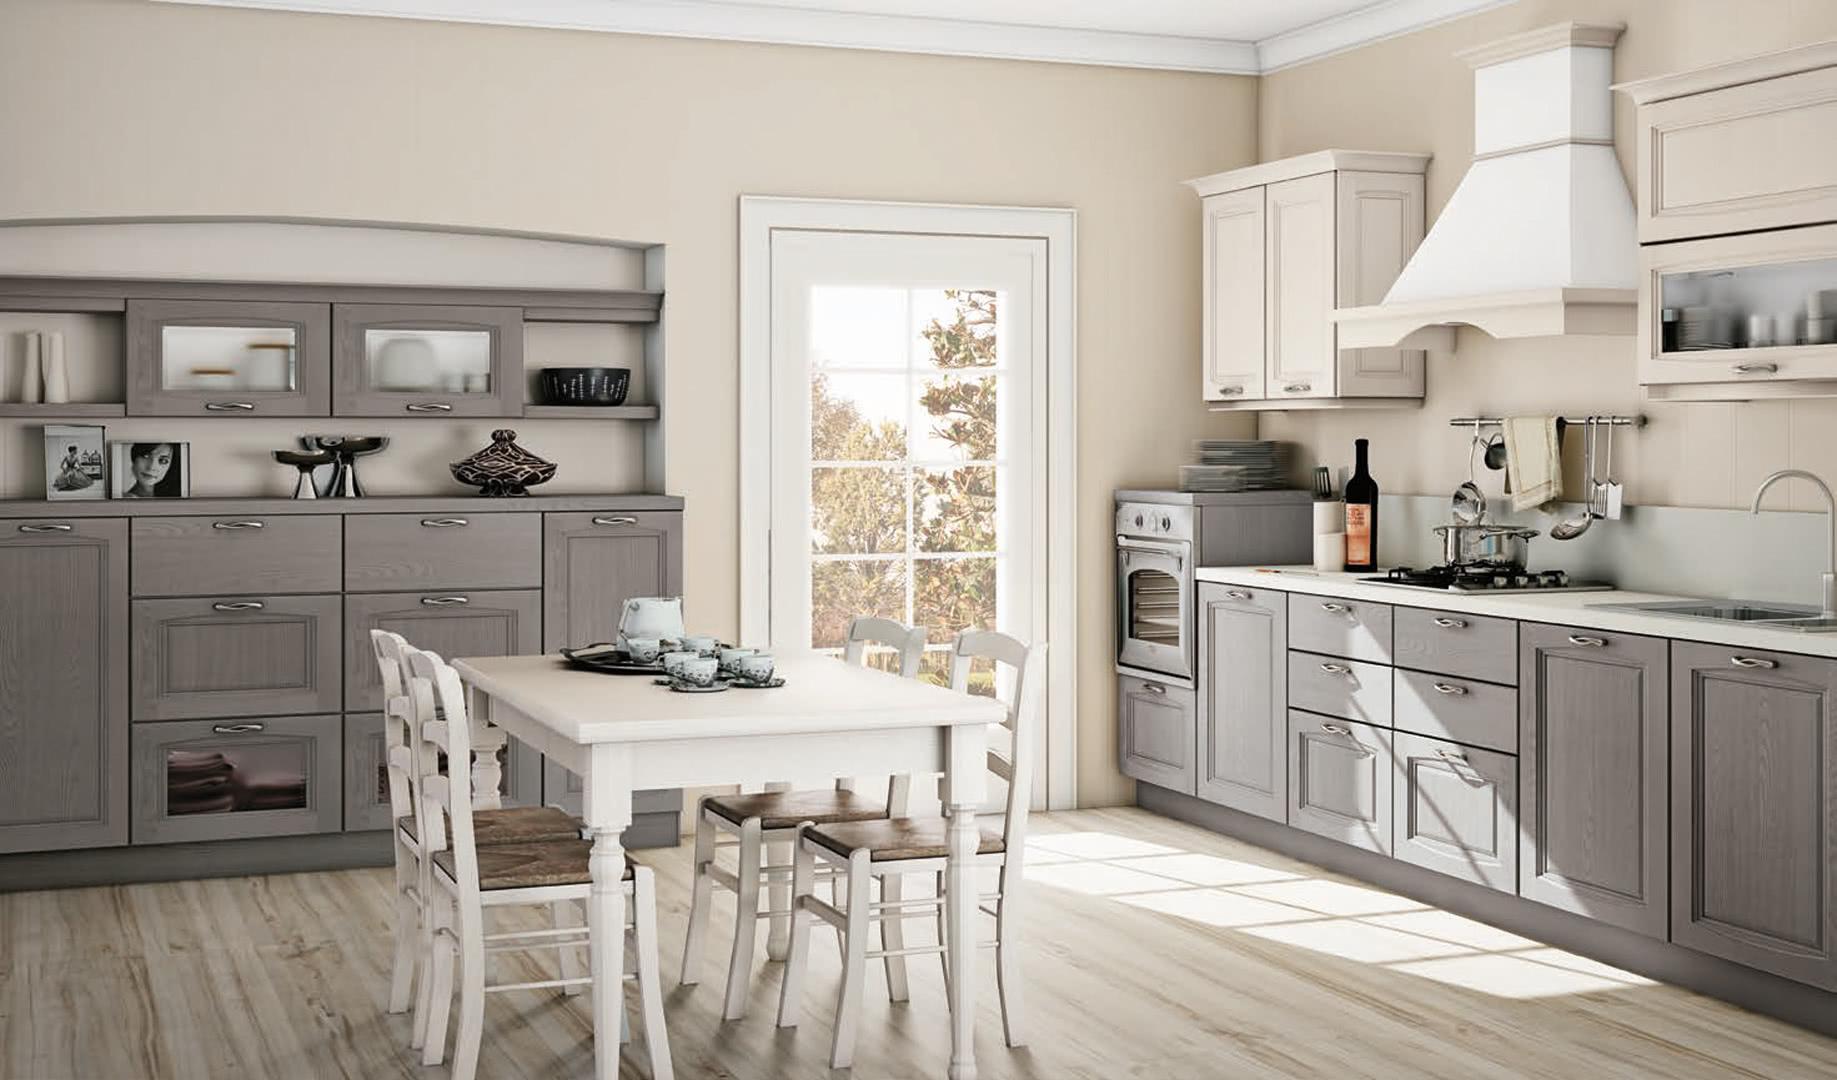 1421_raila-cucina-ambientata-3